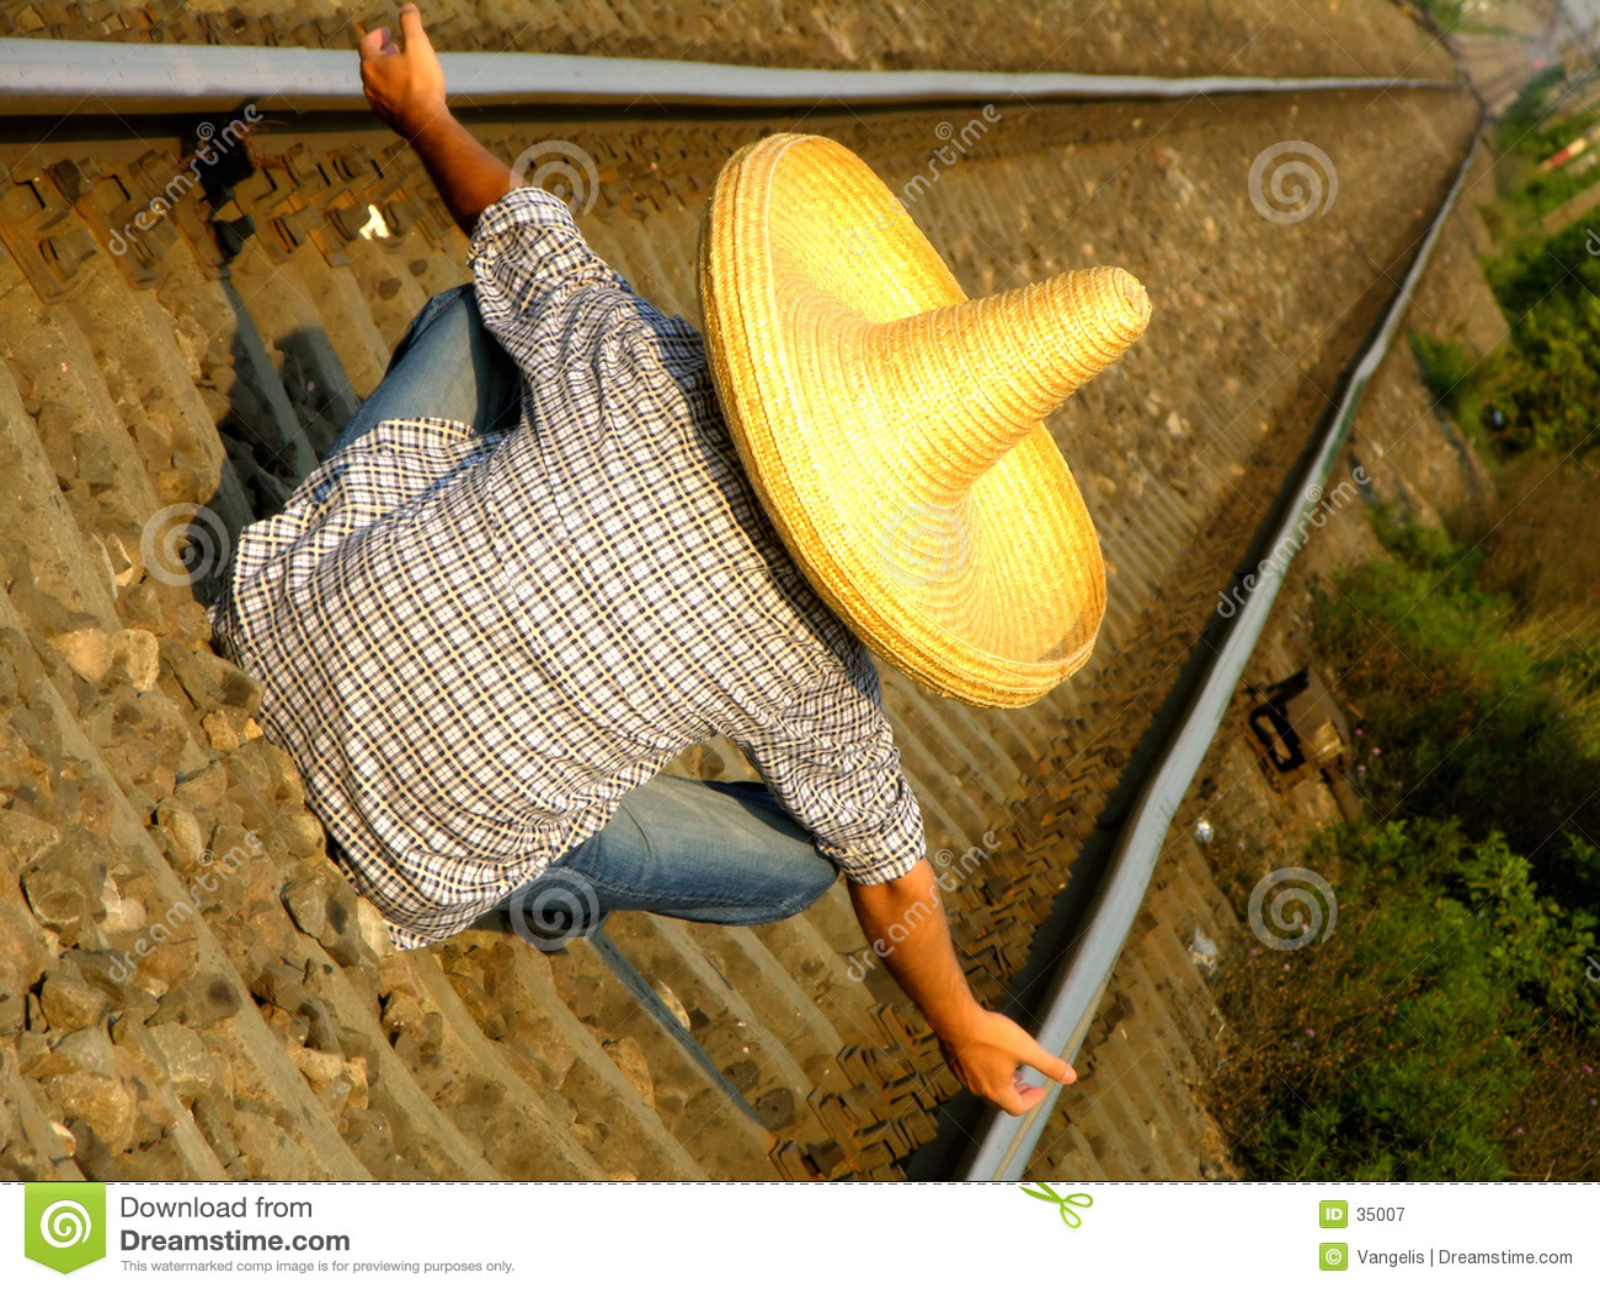 Mexicaanse kerel die de trein wacht